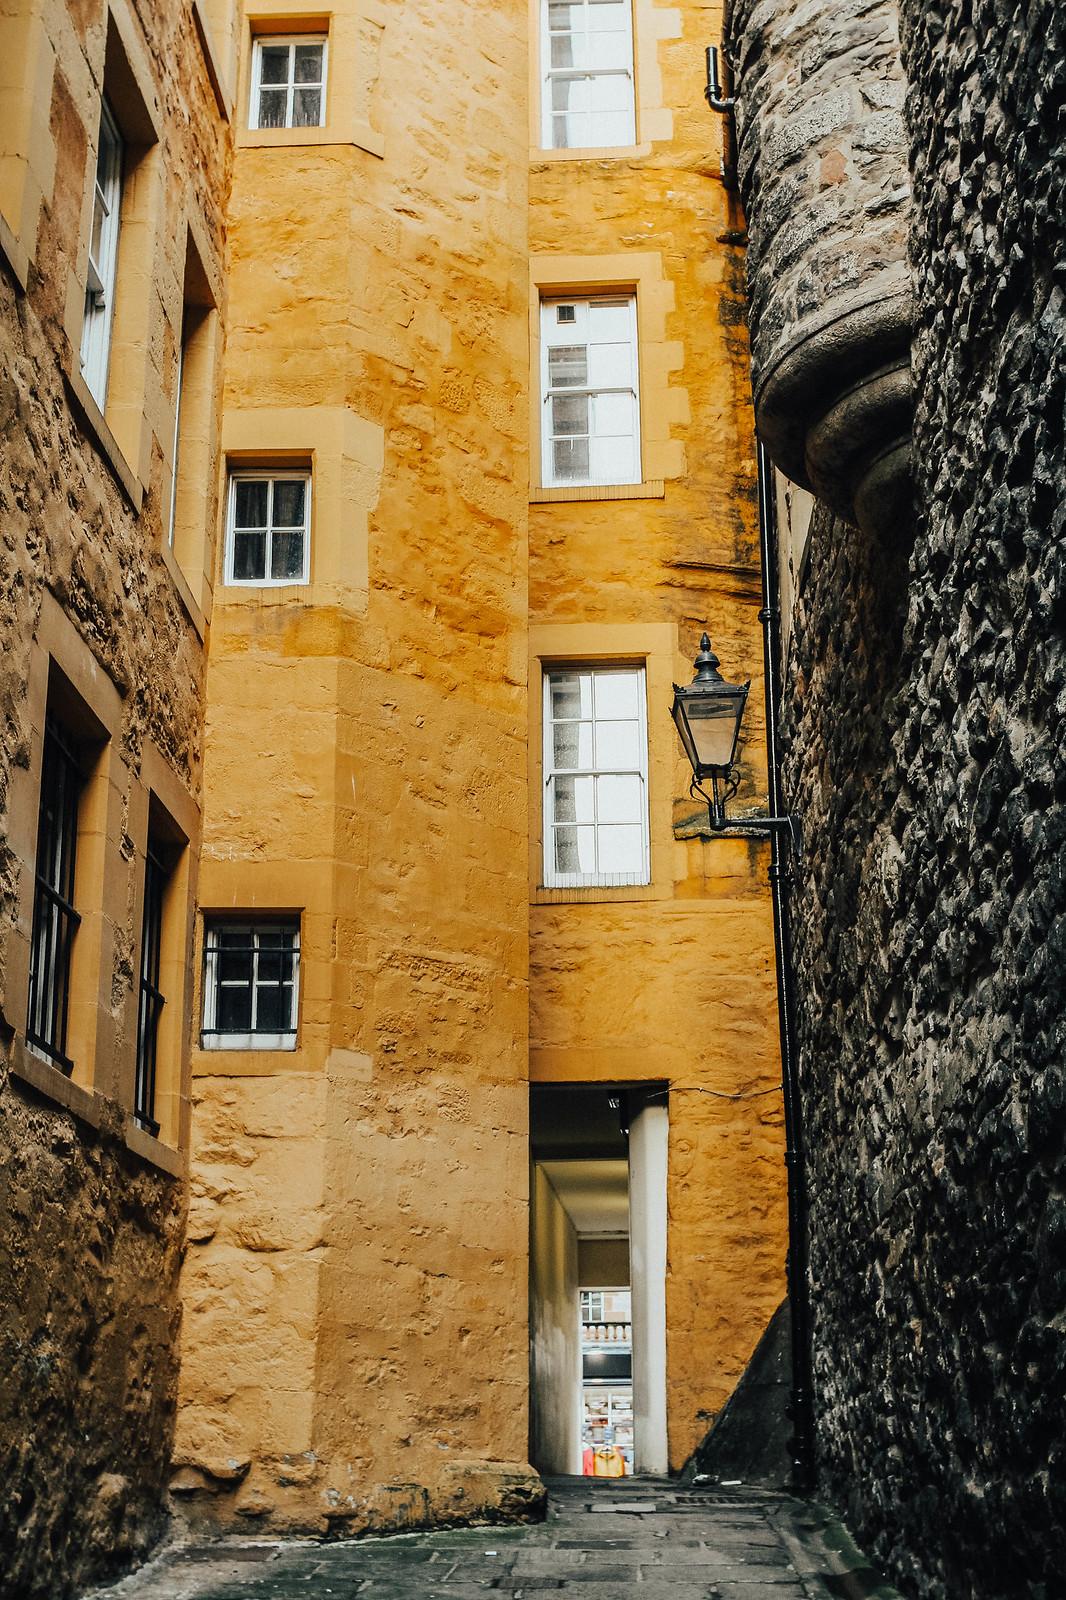 10 Reasons to Love Edinburgh this Valentine's Day